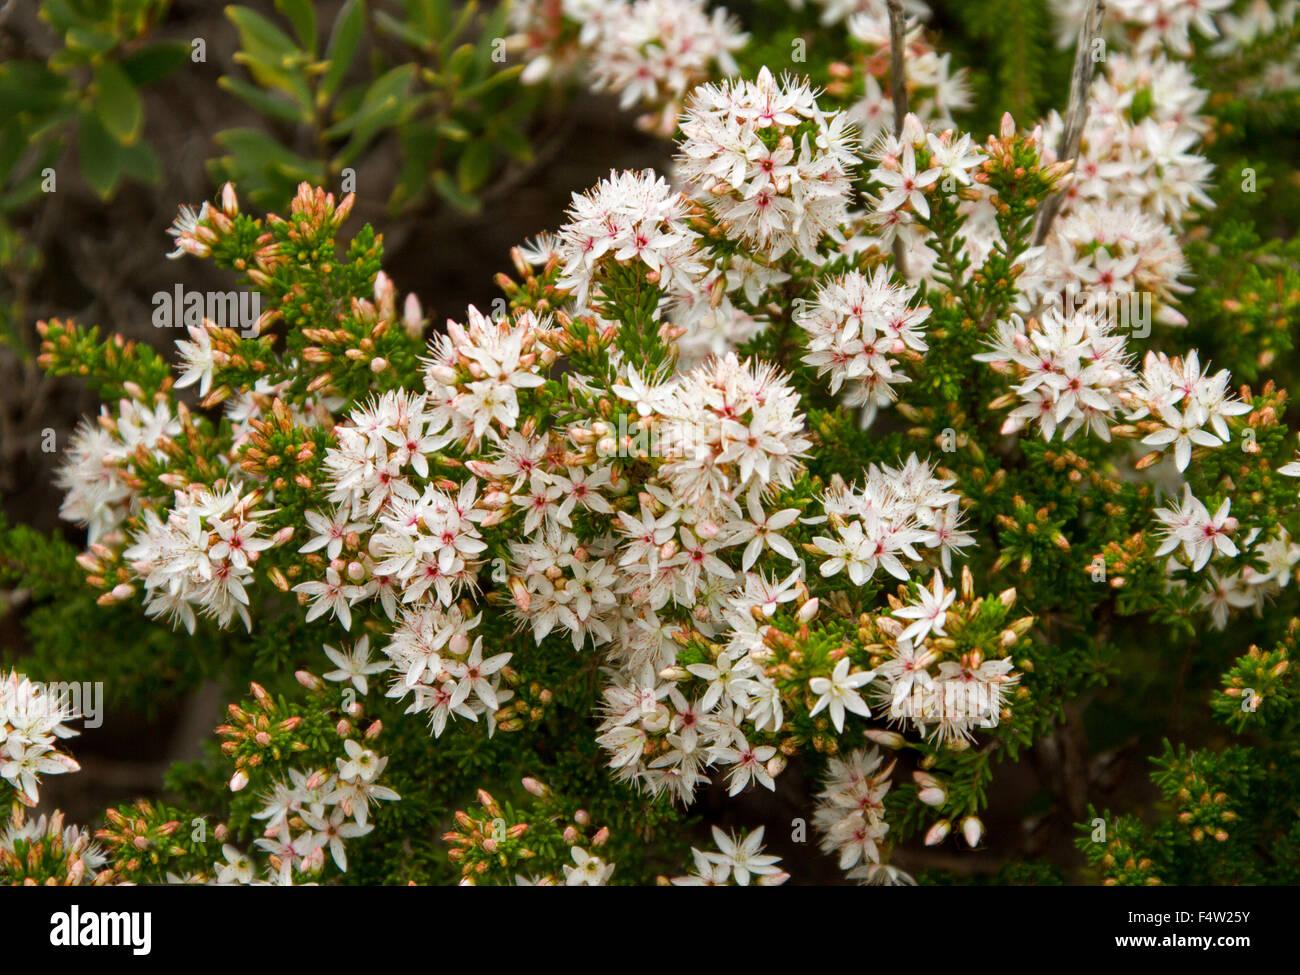 Australian flowers white background stock photos australian cluster of white pale pink flowers of calytrix tetragona fringe flower with foliage mightylinksfo